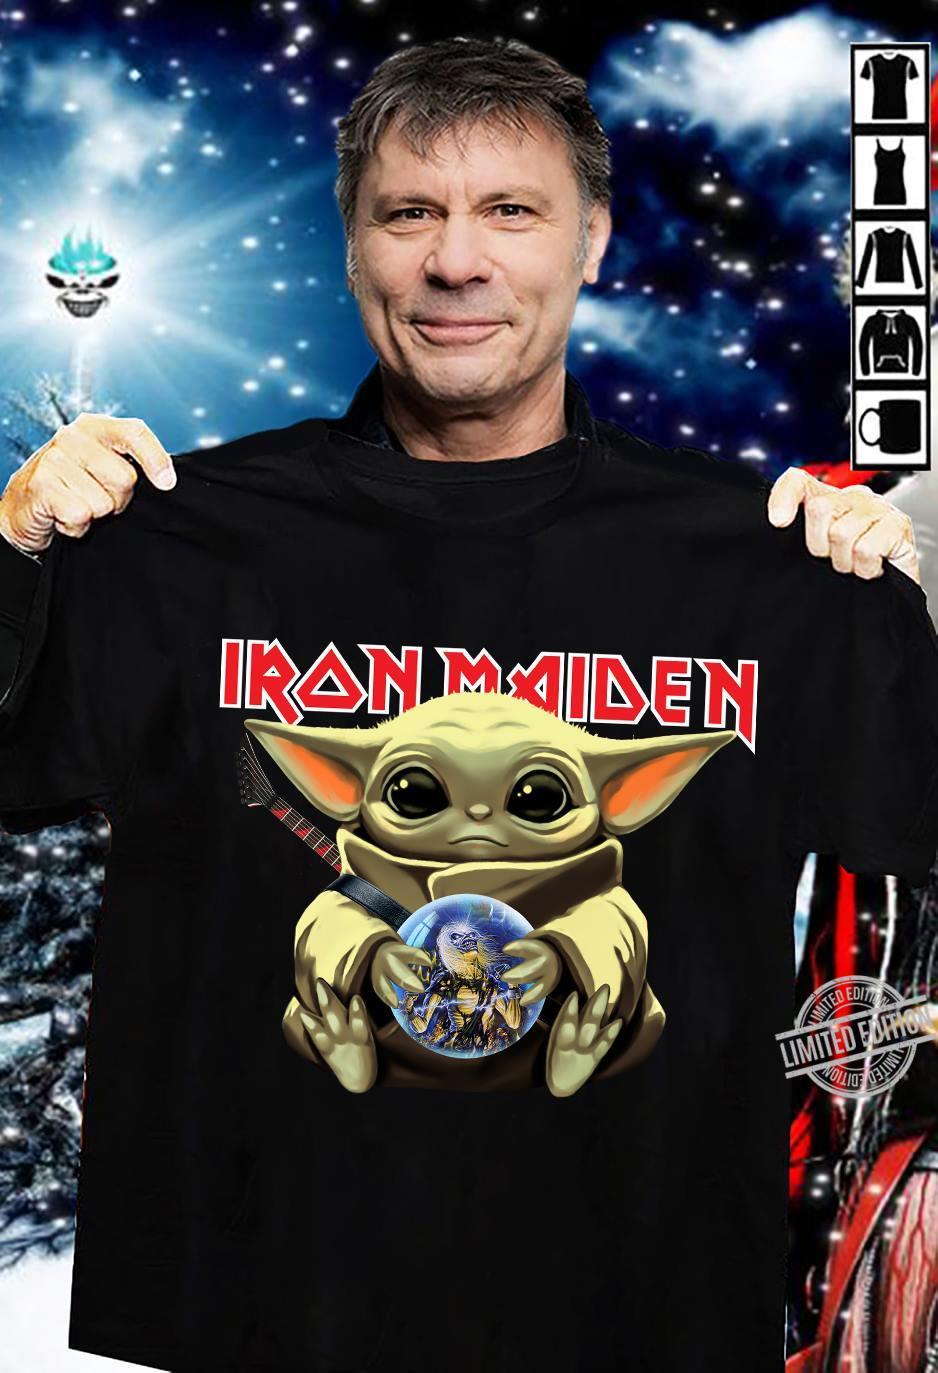 Baby Yoda Hug Iron Maiden Shirt